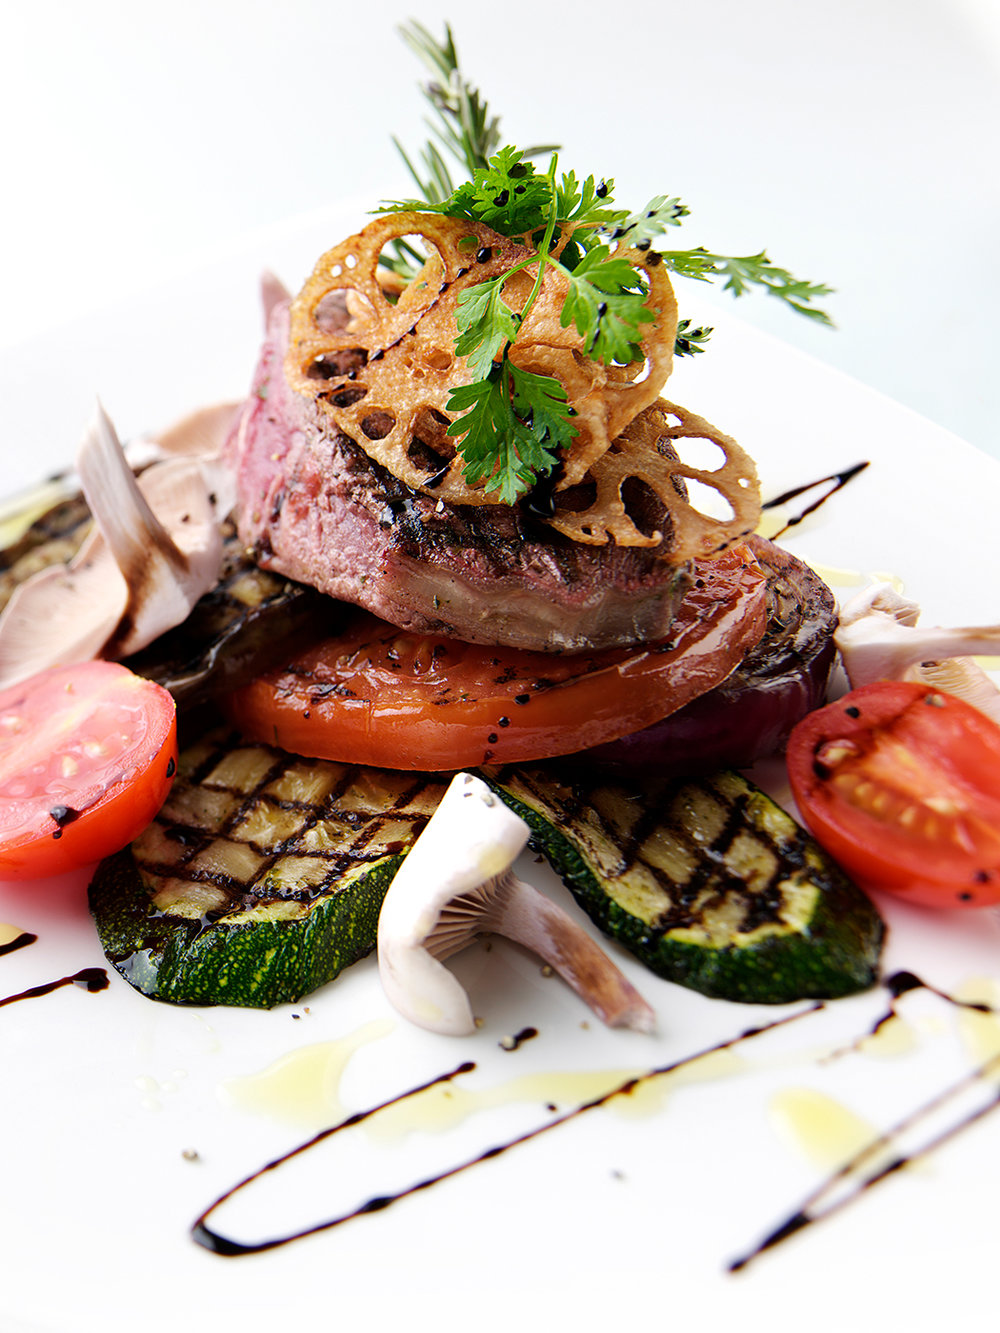 Roast beef restaurant style